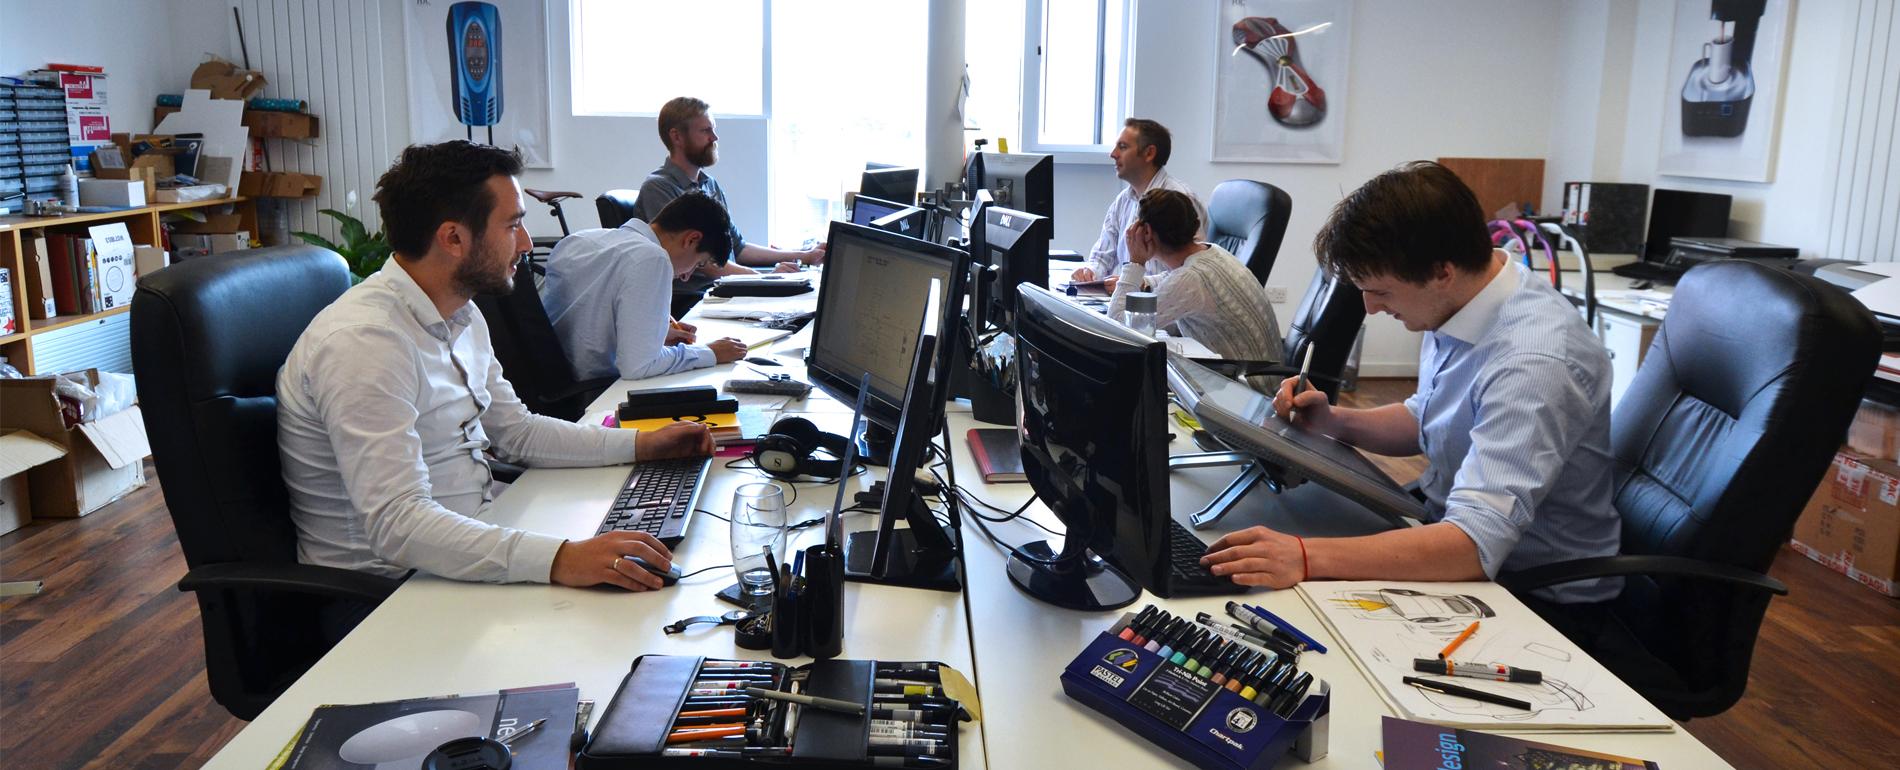 product and industrial design studio london hjc design ltd